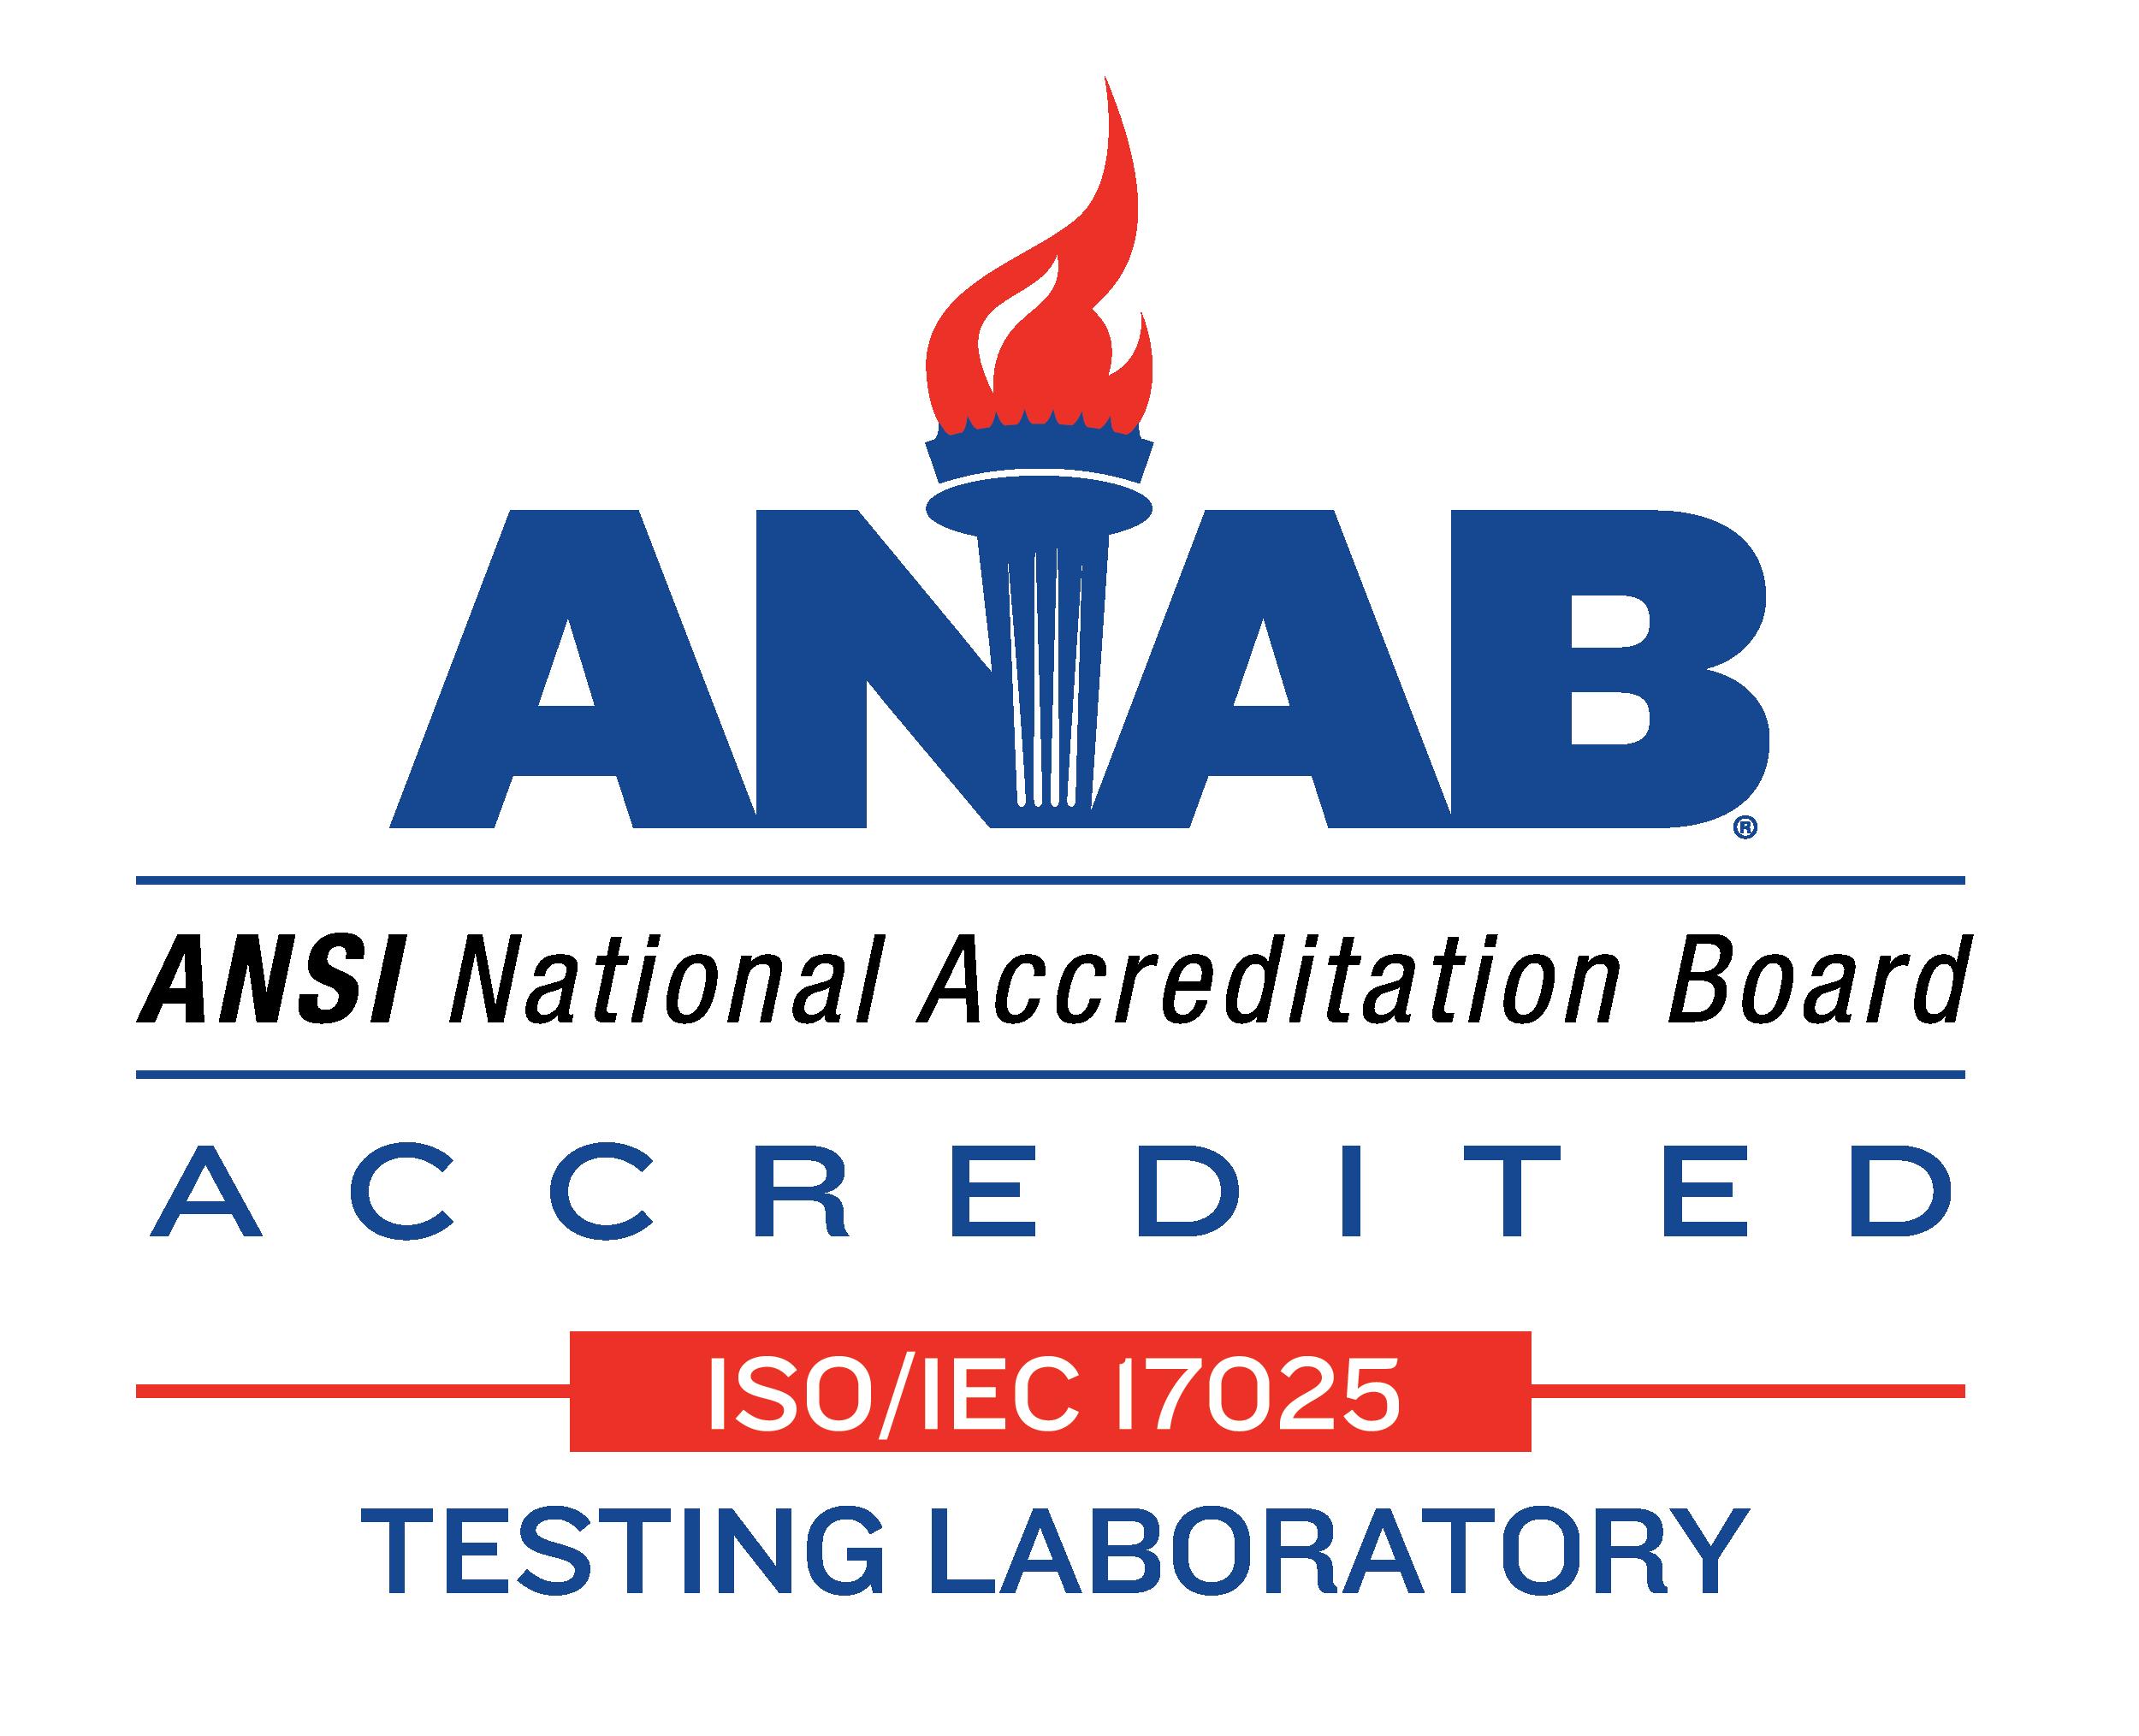 anab ISO/IEC 17025 testing Laboratory